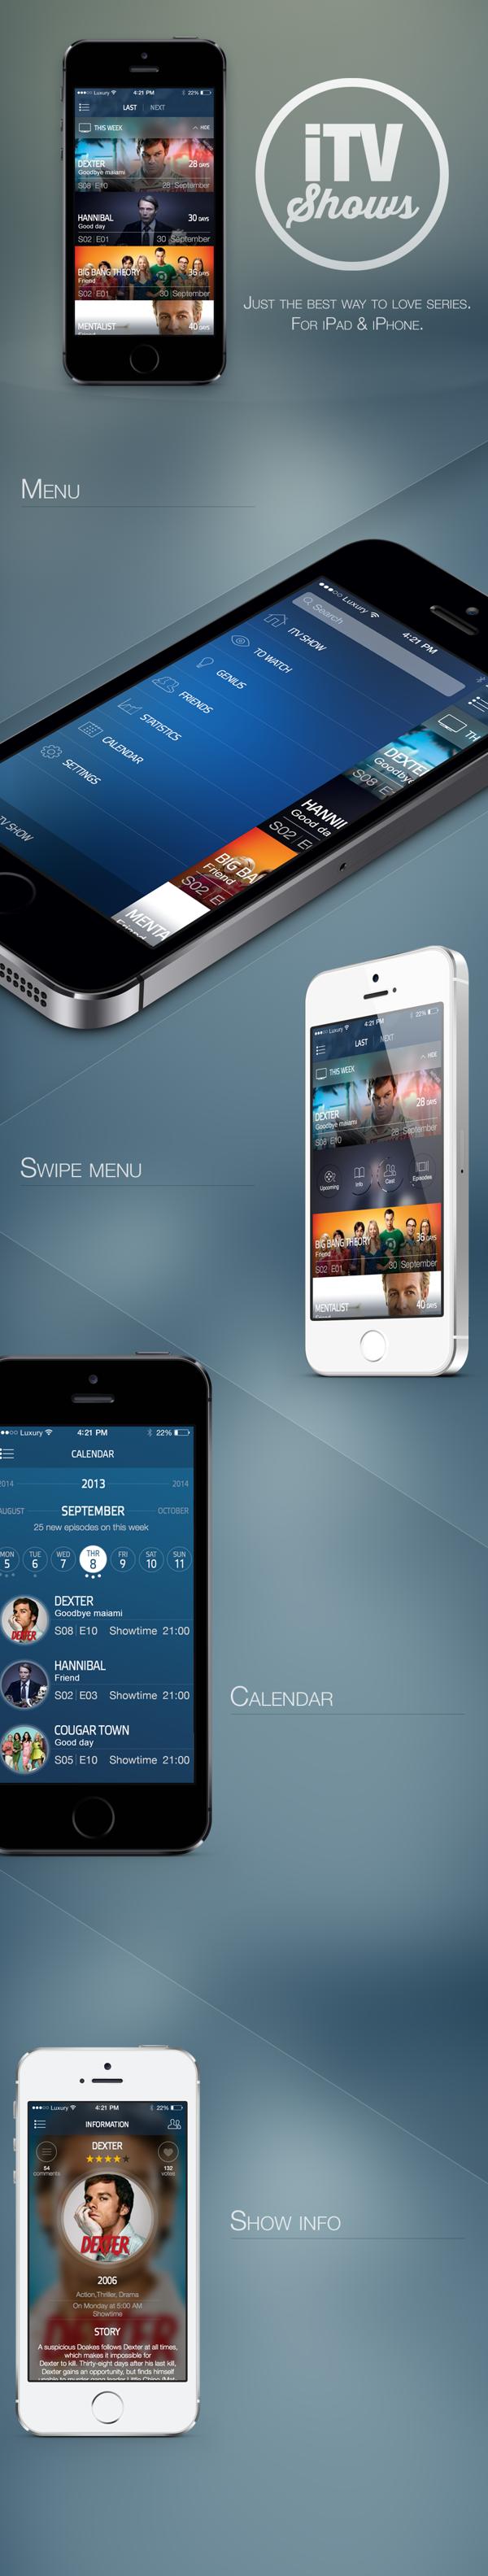 iTVShow App by Sergey Skidan, via Behance Mobile web